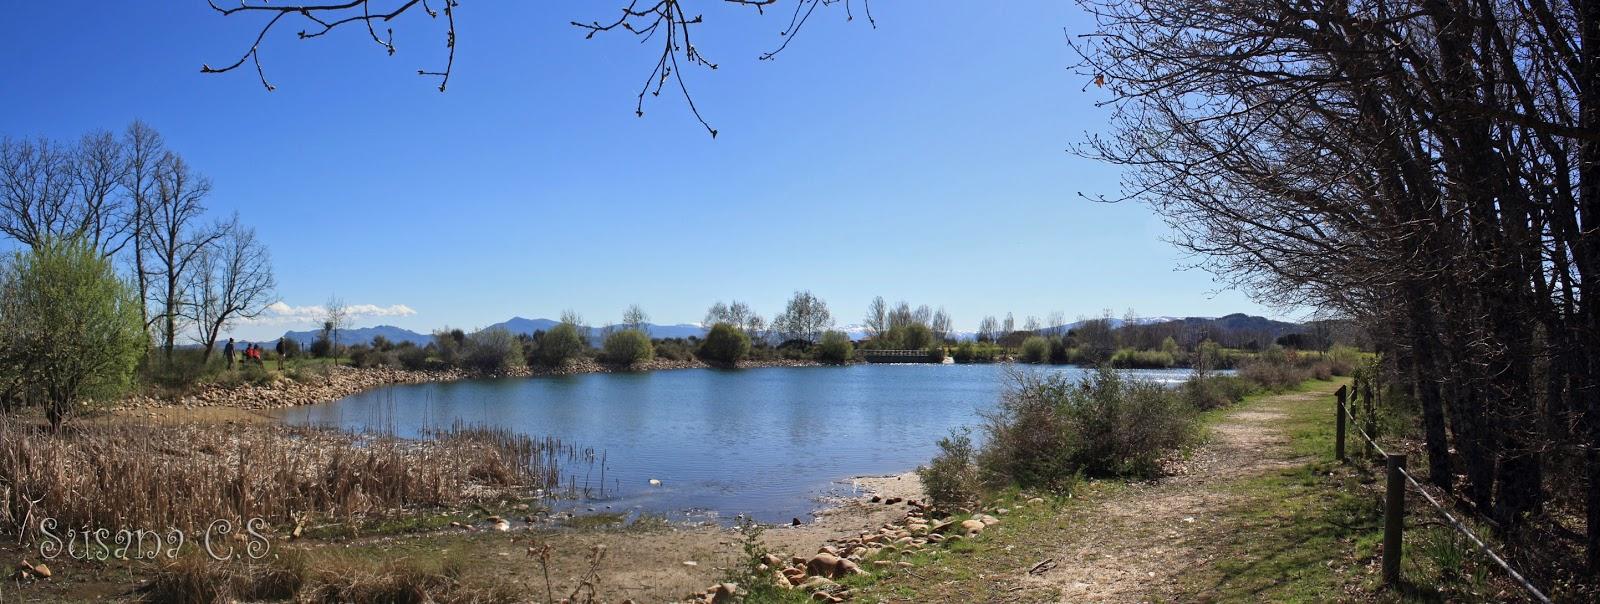 Sierra del rinc n madrid for Construir laguna artificial